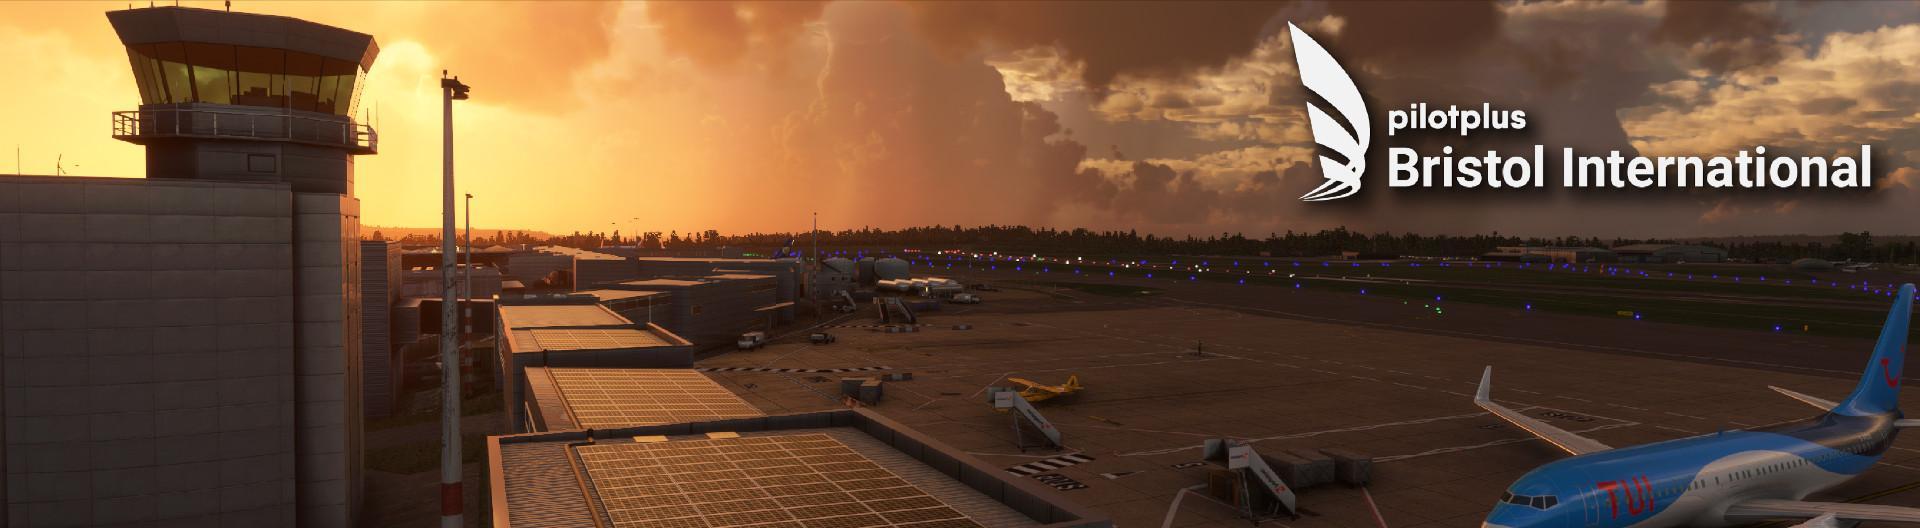 Image of Bristol Airport for Microsoft Flight Simulator by Pilot Plus